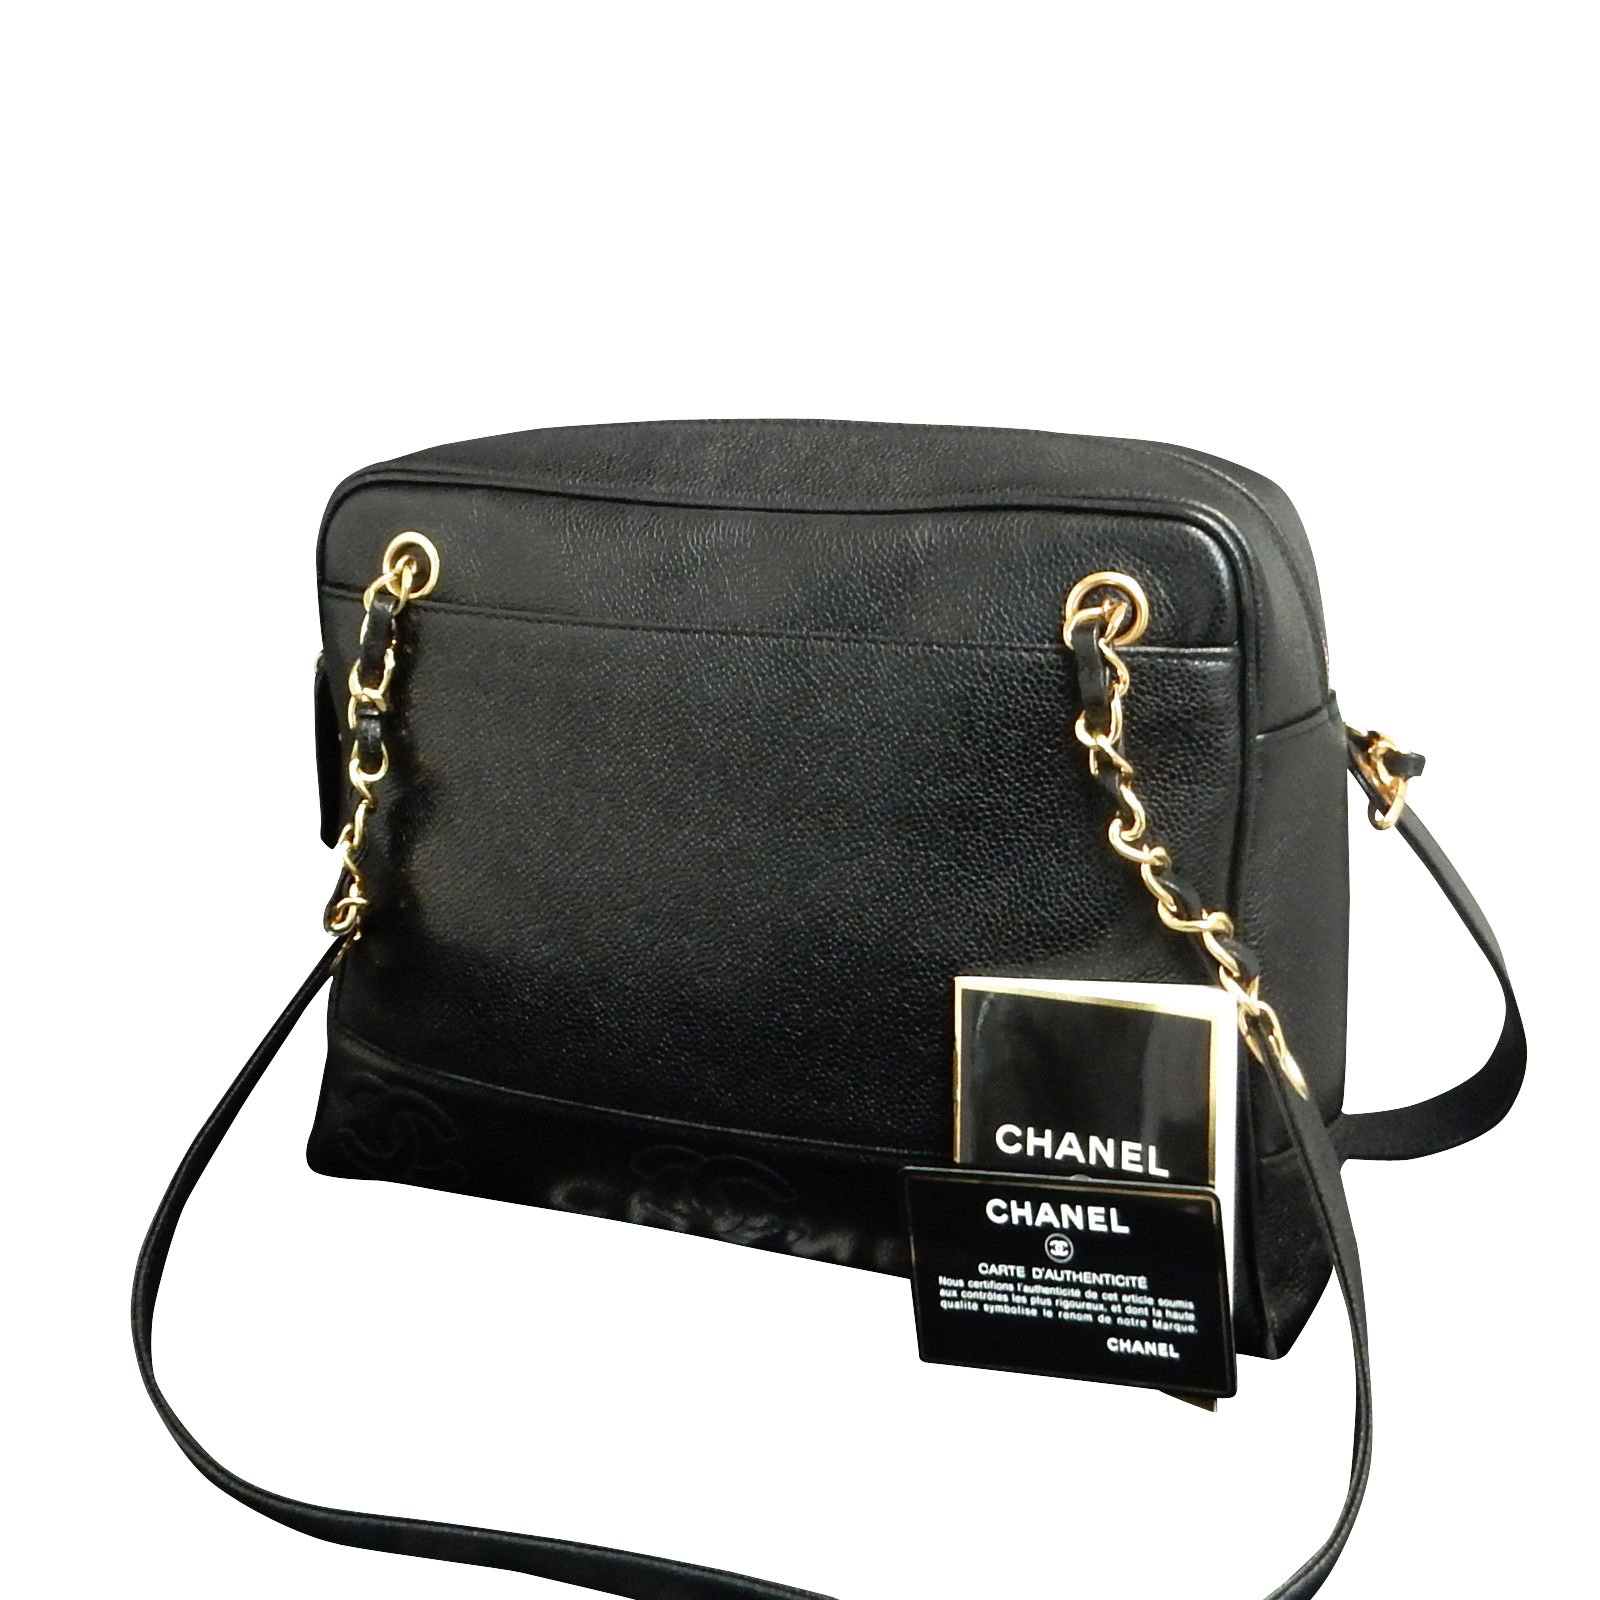 bc5ea79a55ff Chanel Triple Cc Black Caviar Handbags Other Ref 86855 Joli. Photo. Chanel  Black Caviar Leather Quilted Tote Bag ...